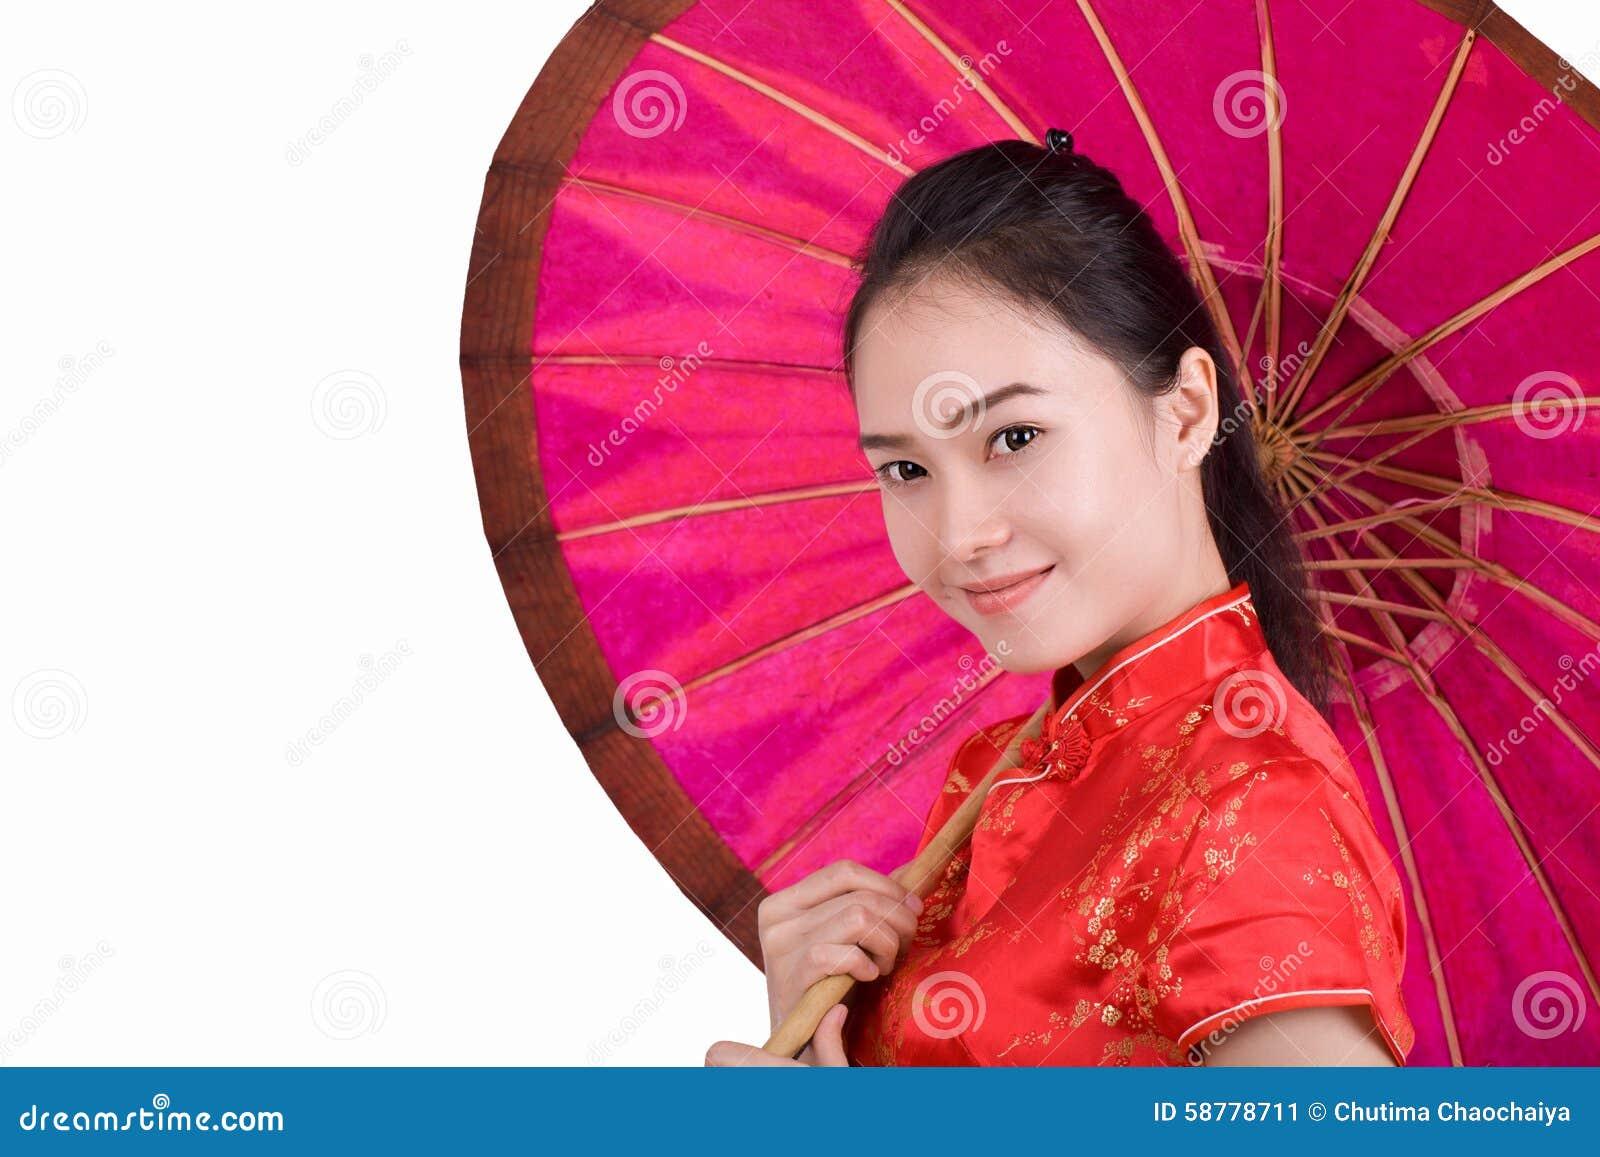 Image Result For Insurance Umbrellaa